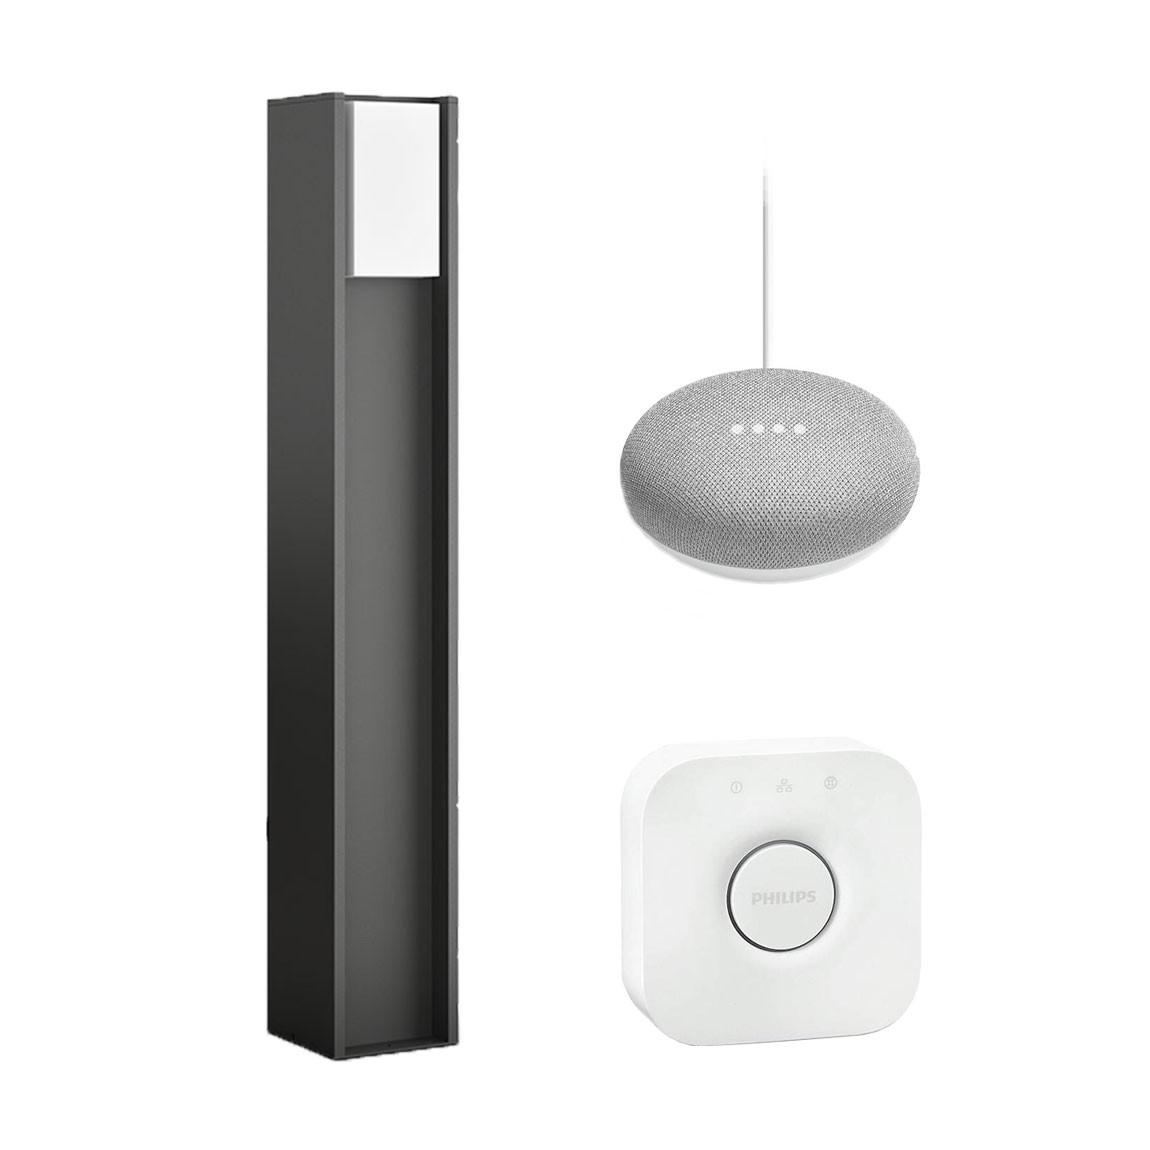 Philips Hue Garten Starter Set Turaco Wegeleuchte + gratis Google Home Mini